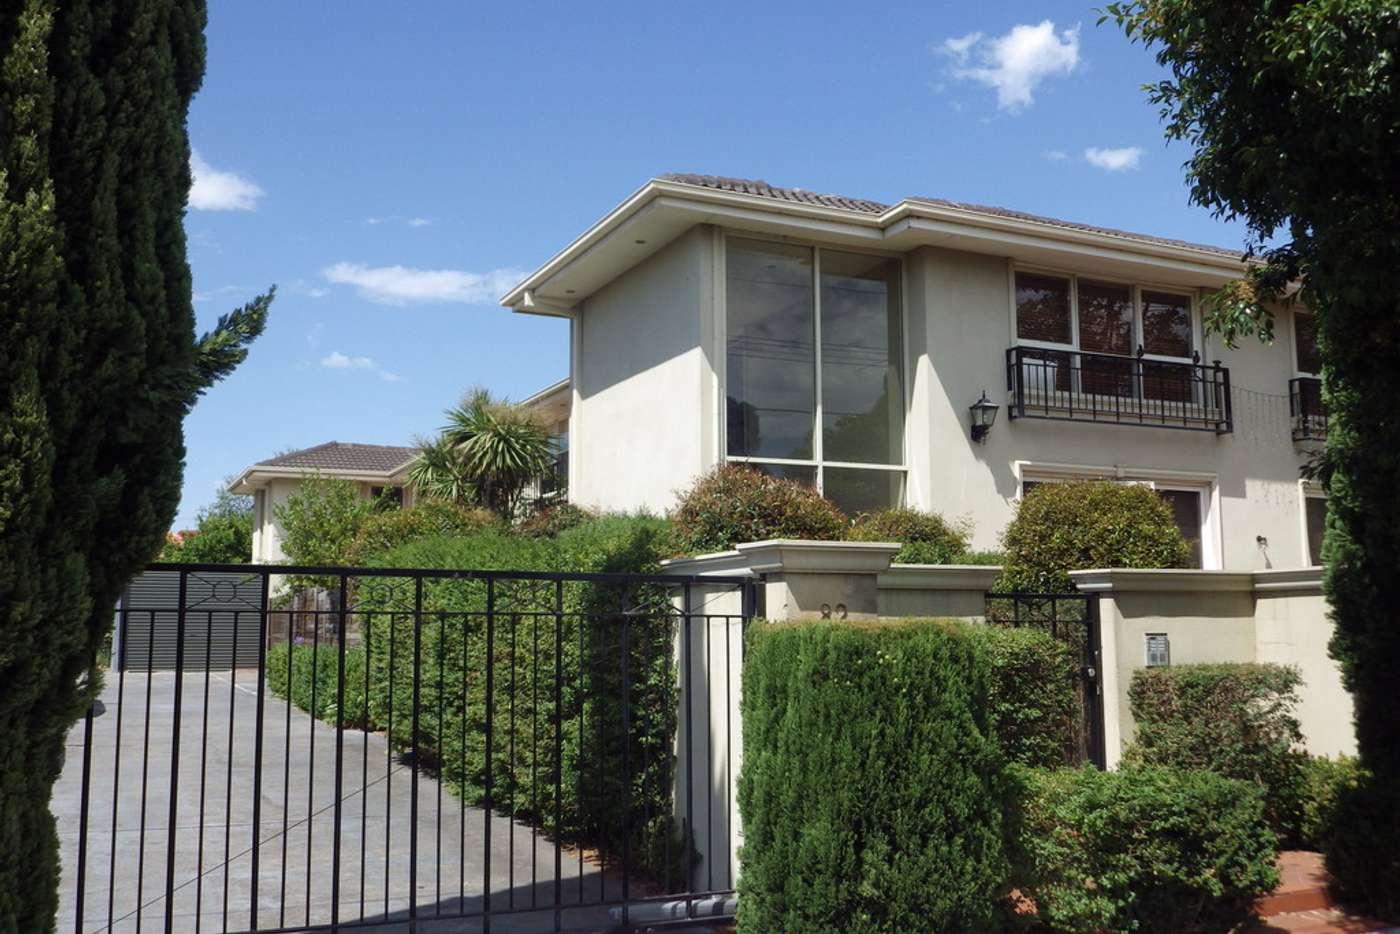 Main view of Homely apartment listing, 4/82 Gooch Street, Thornbury VIC 3071